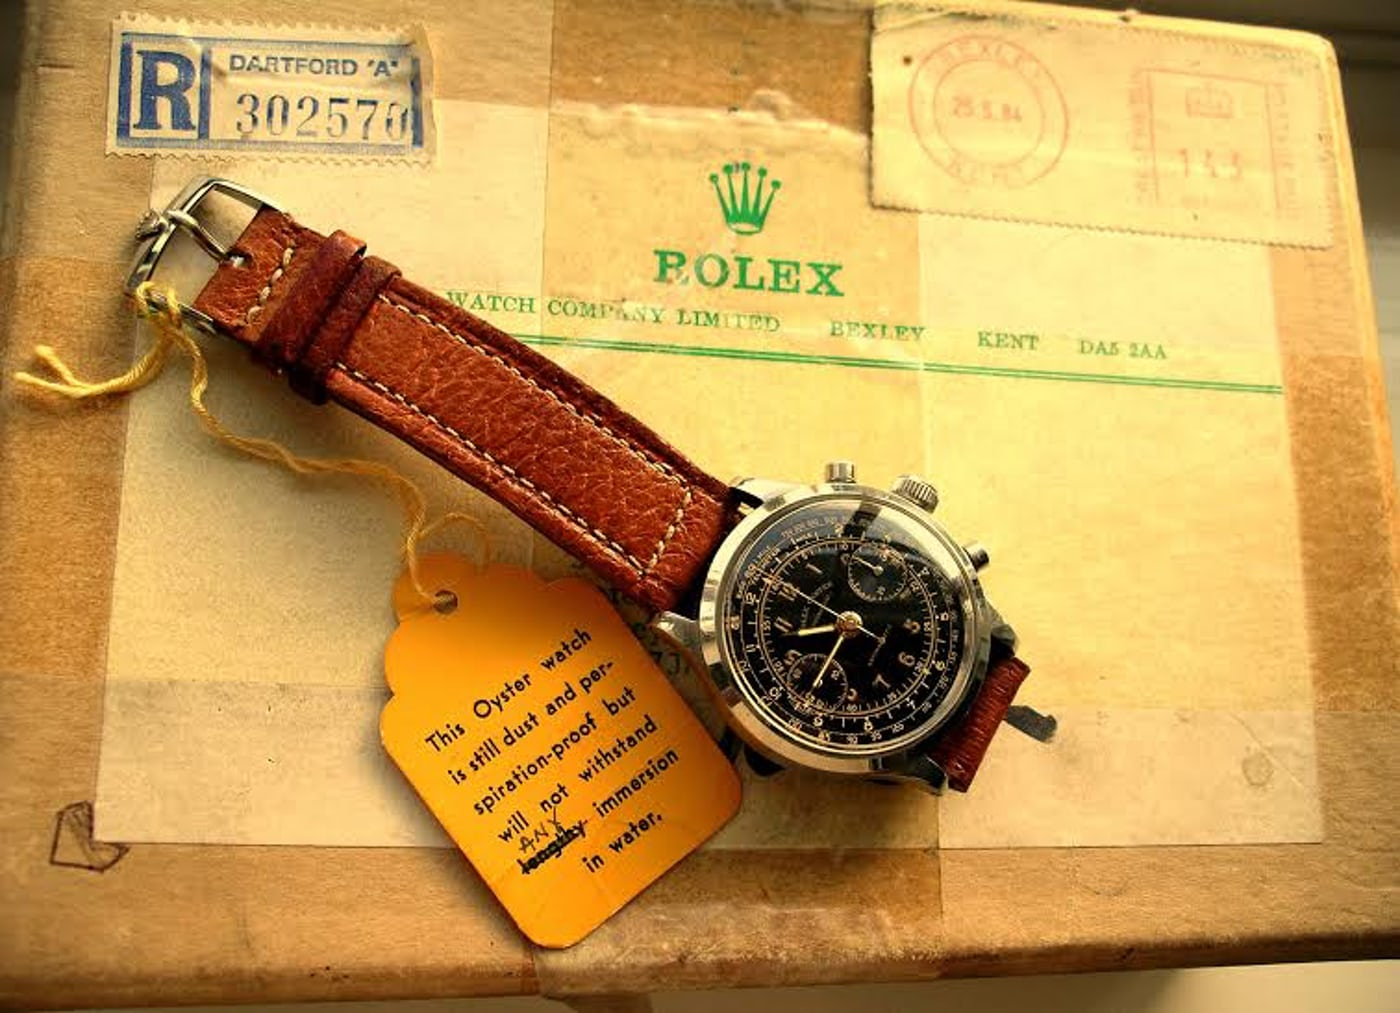 WWII Rolex Chronograph | Wristwatches360